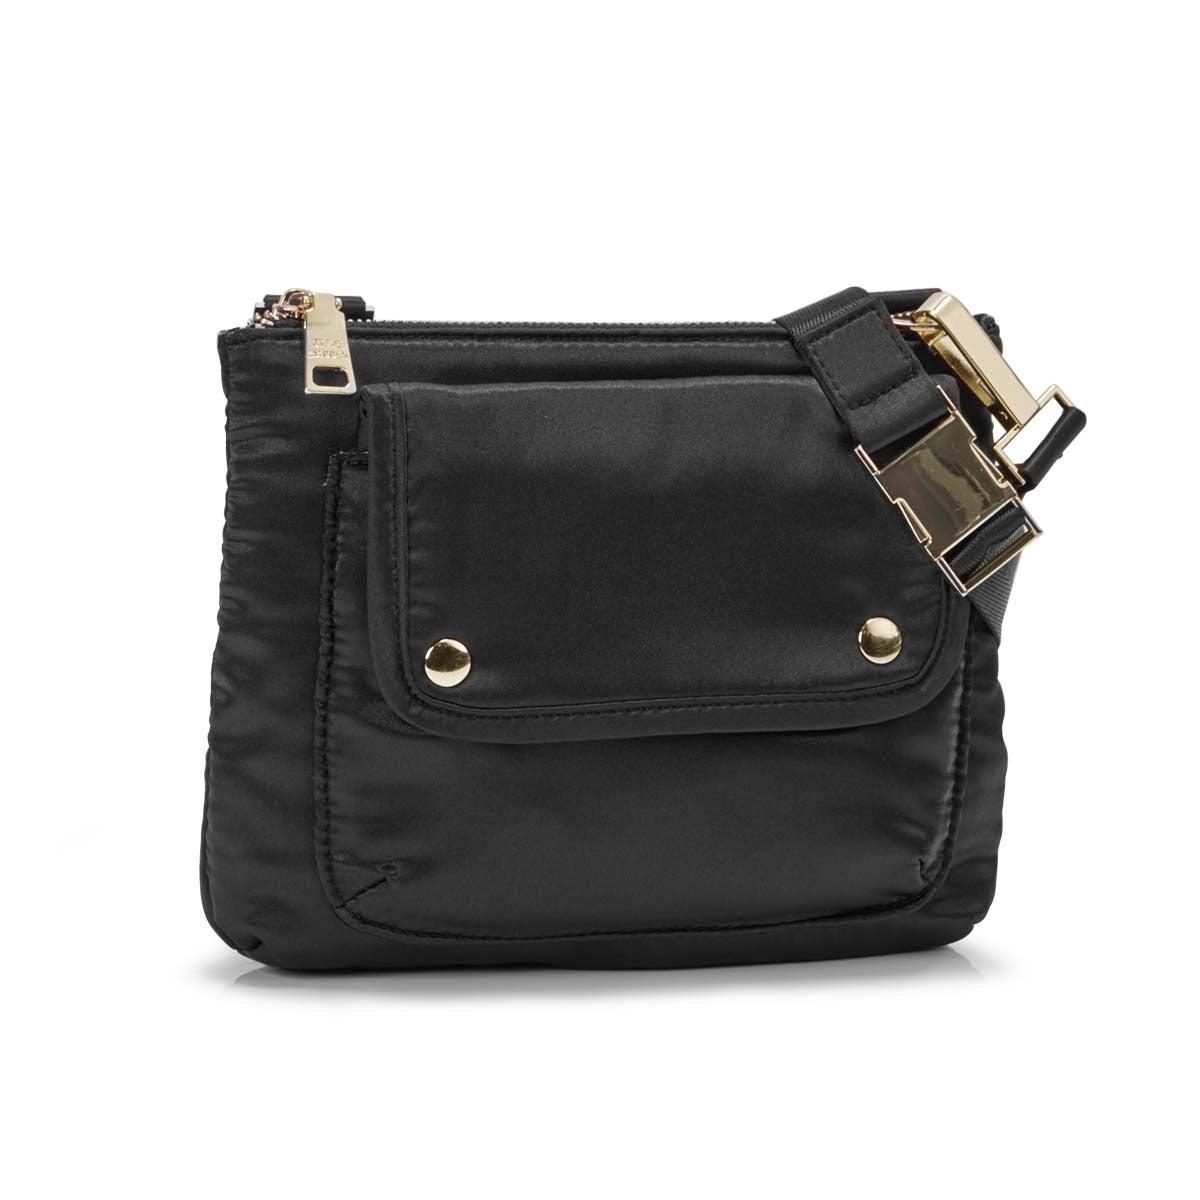 Lds BViola black cross body bag